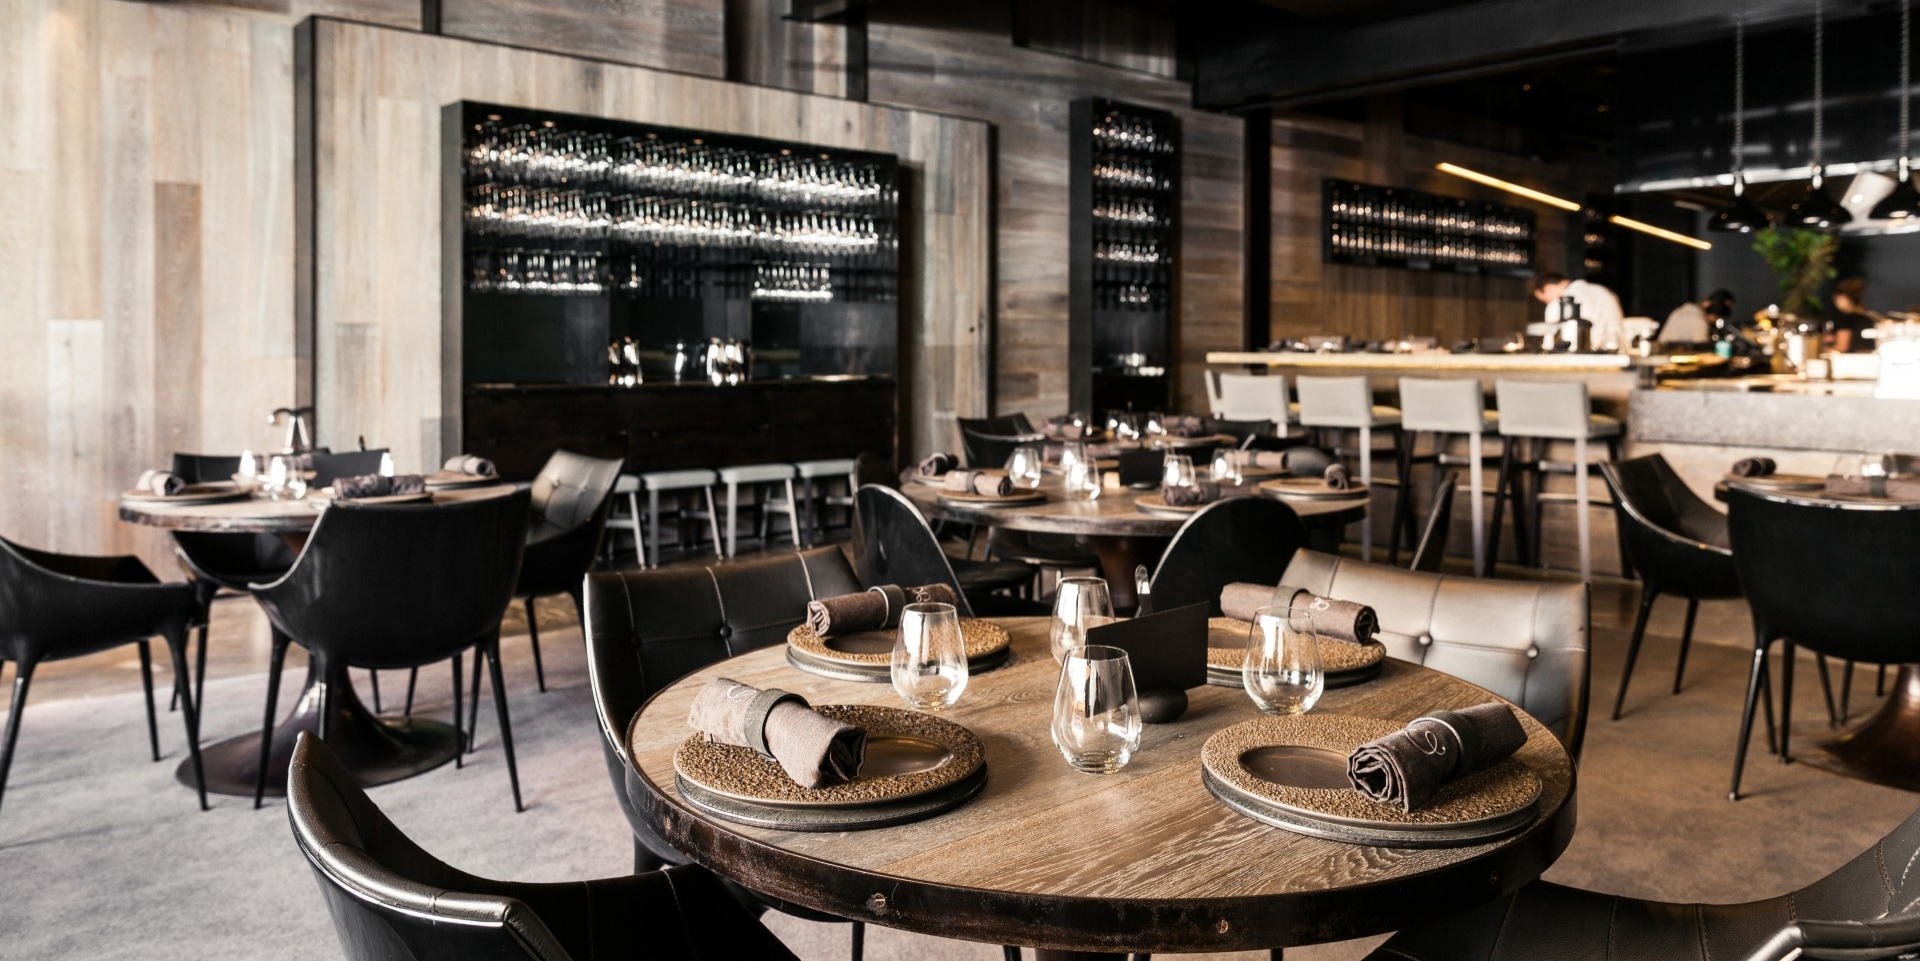 Hirsch Bedner Associates An Experience in Hospitality Interior Design 3